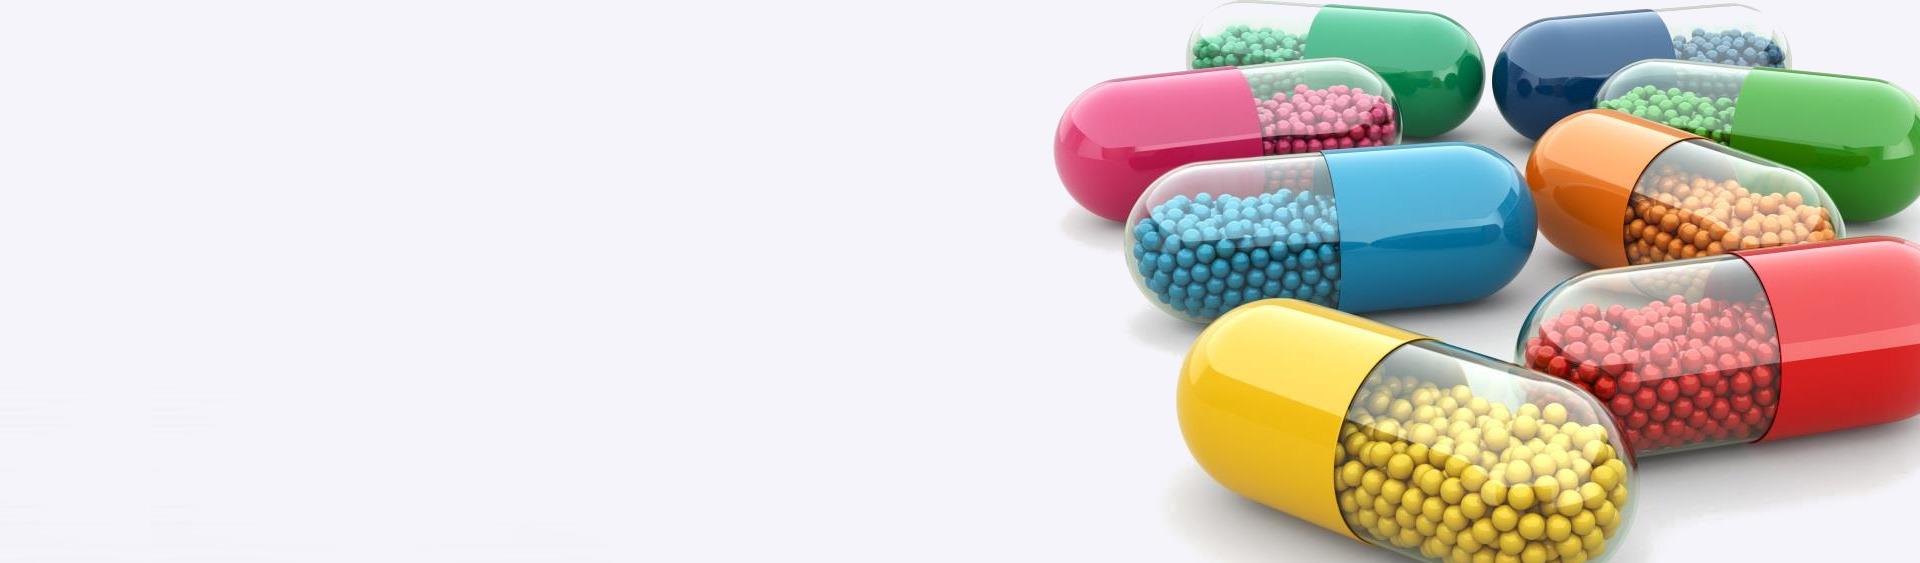 integratori-vitamine-sali-farmacia